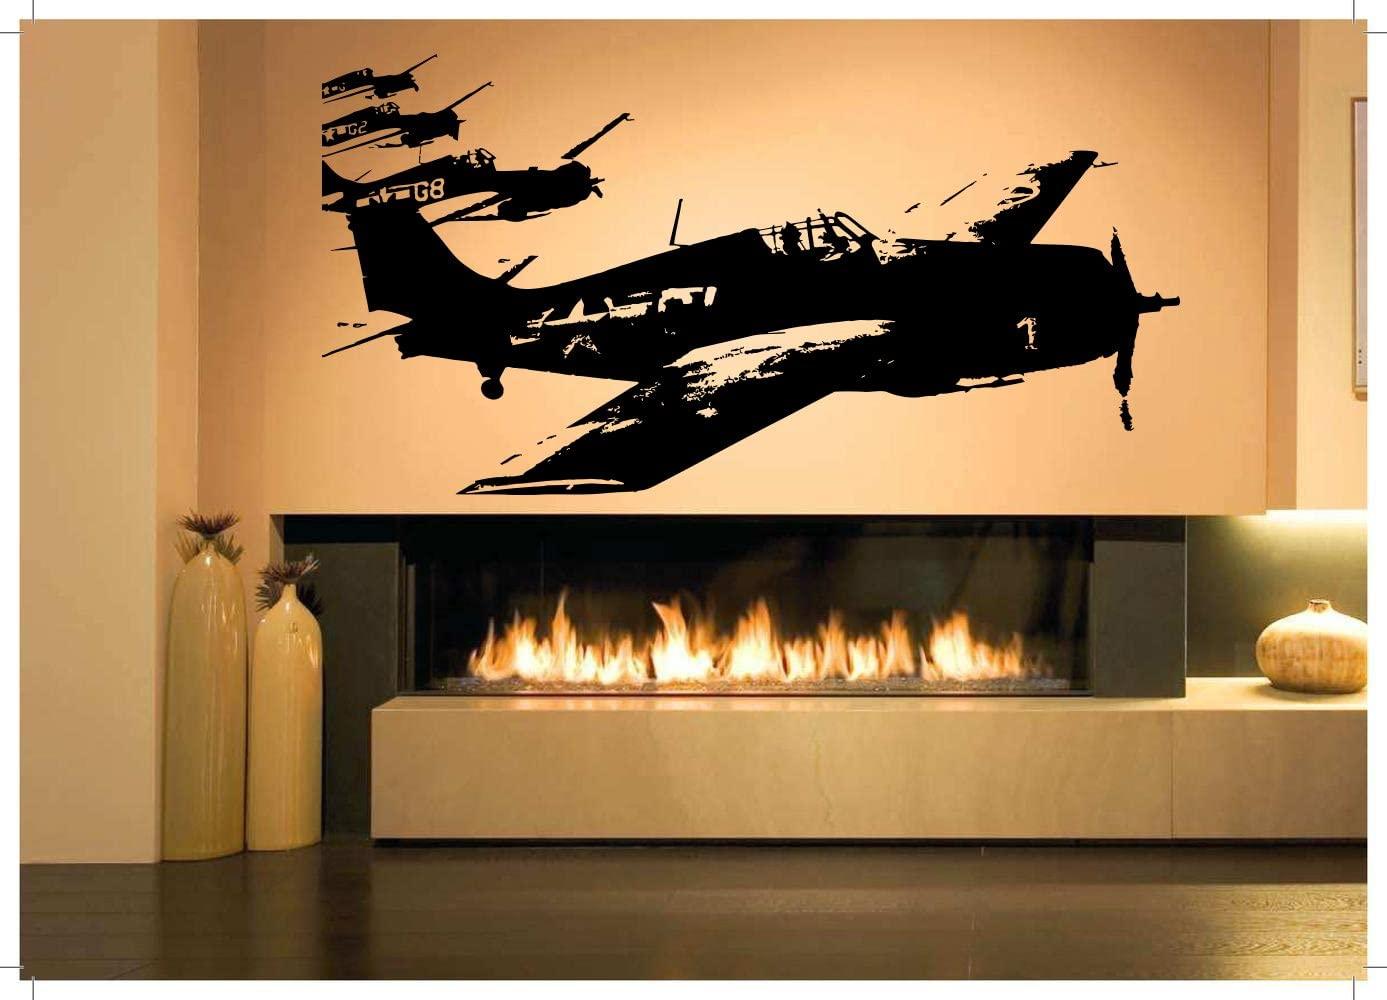 Wall Room Decor Art Vinyl Sticker Mural Decal Air Plane Jet Fighter Pilot Poster Boy Bedroom Nursery Playroom AS2804